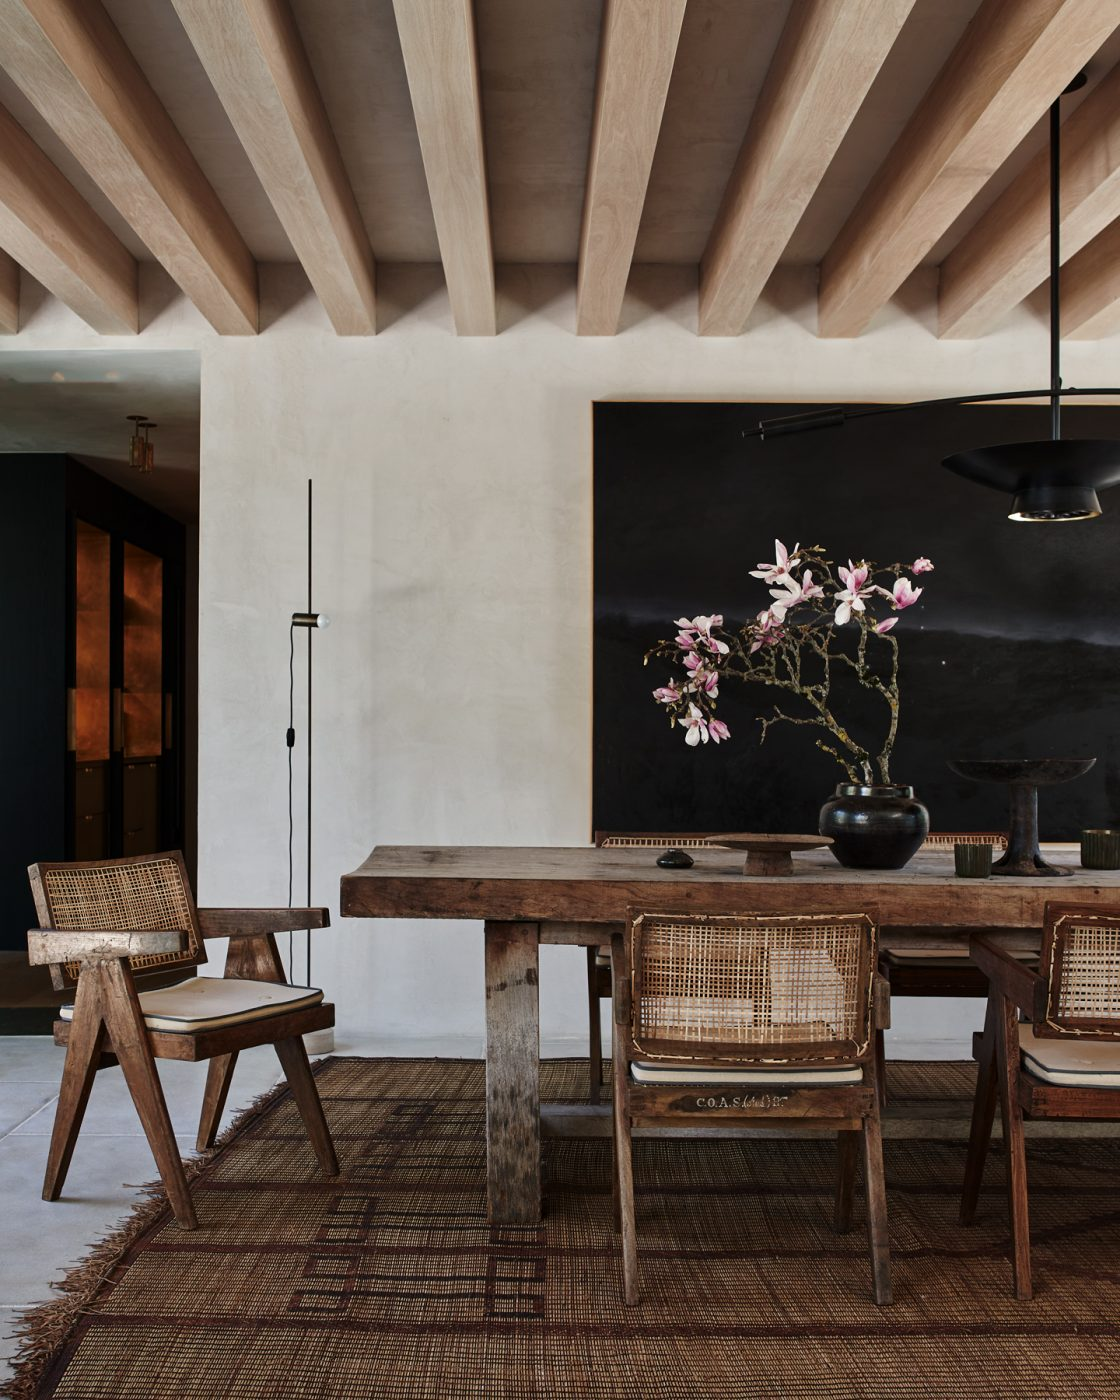 Dining room in Malibu designed by Alexander